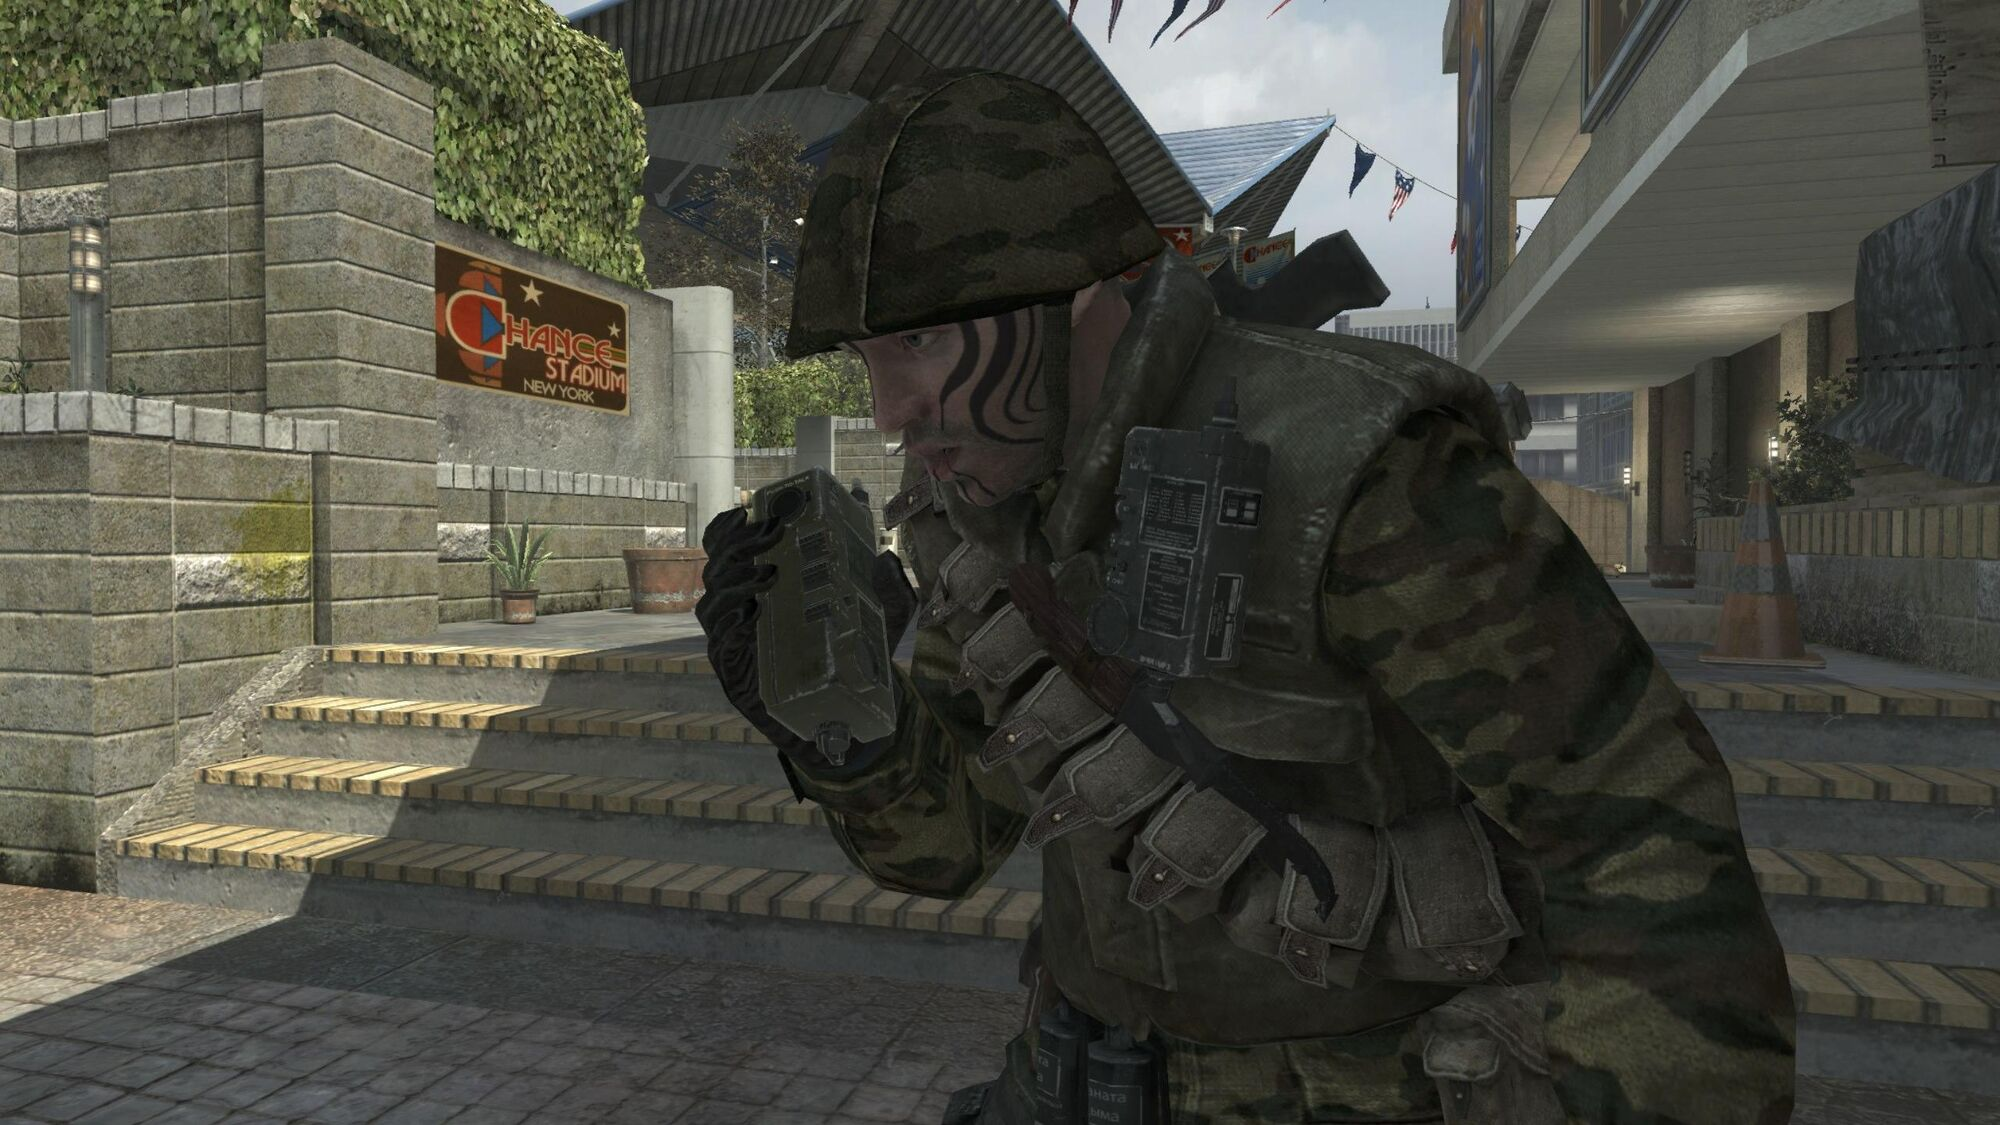 Call of duty 4 pc mod menu | Best Black ops 2 gsc Mod menu 1 19 {Ps3